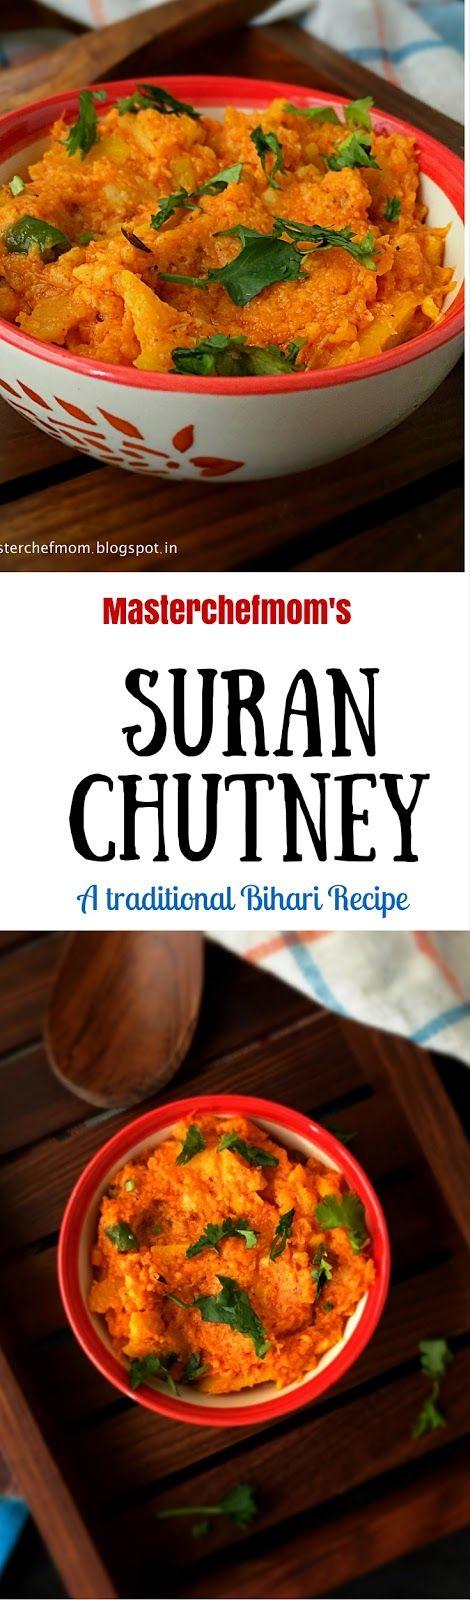 MASTERCHEFMOM: Bihari Suran Chutney | Bihari Ole/Oal Chutney |Bihar Style Elephant Yam Chutney | Jimmikand Chutney |Traditional Chutney Recipe | Gluten Free and Vegan Recipe